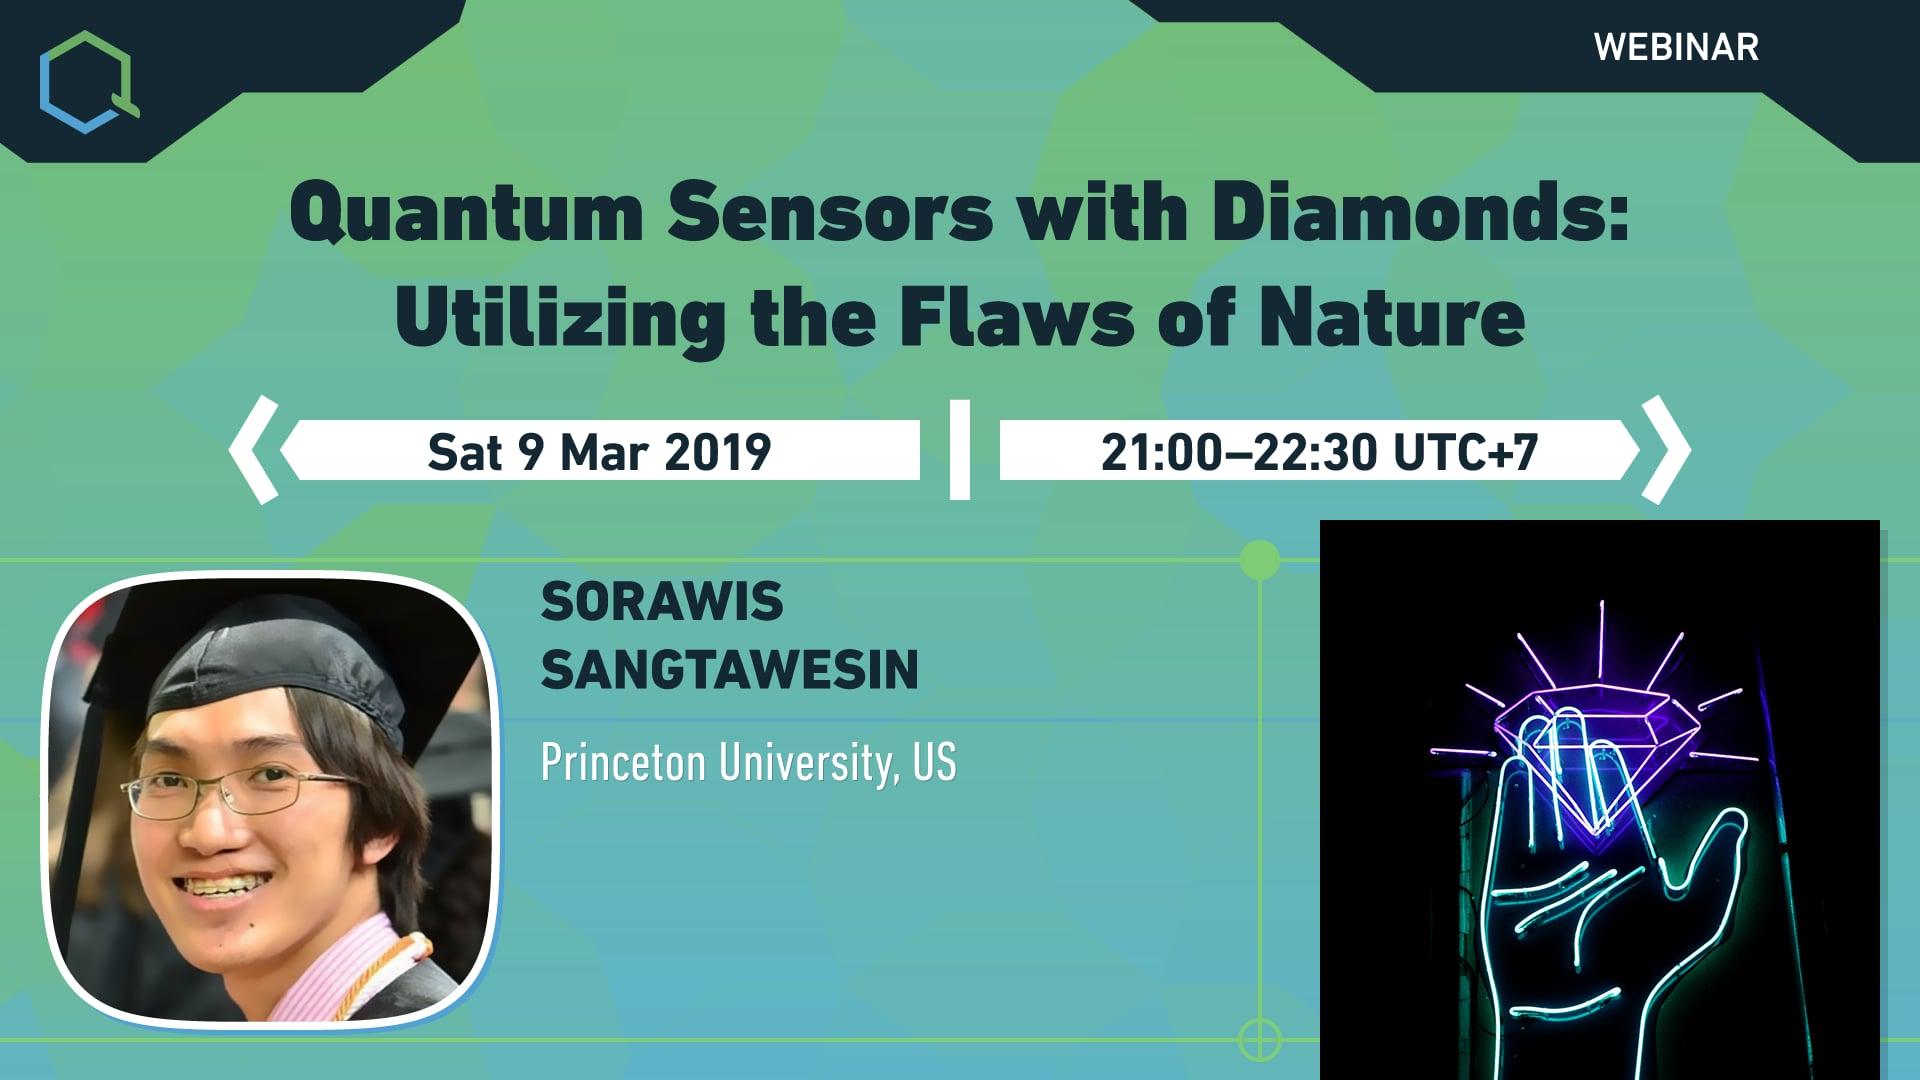 Quantum Sensors with Diamonds: Utilizing the Flaws of Nature